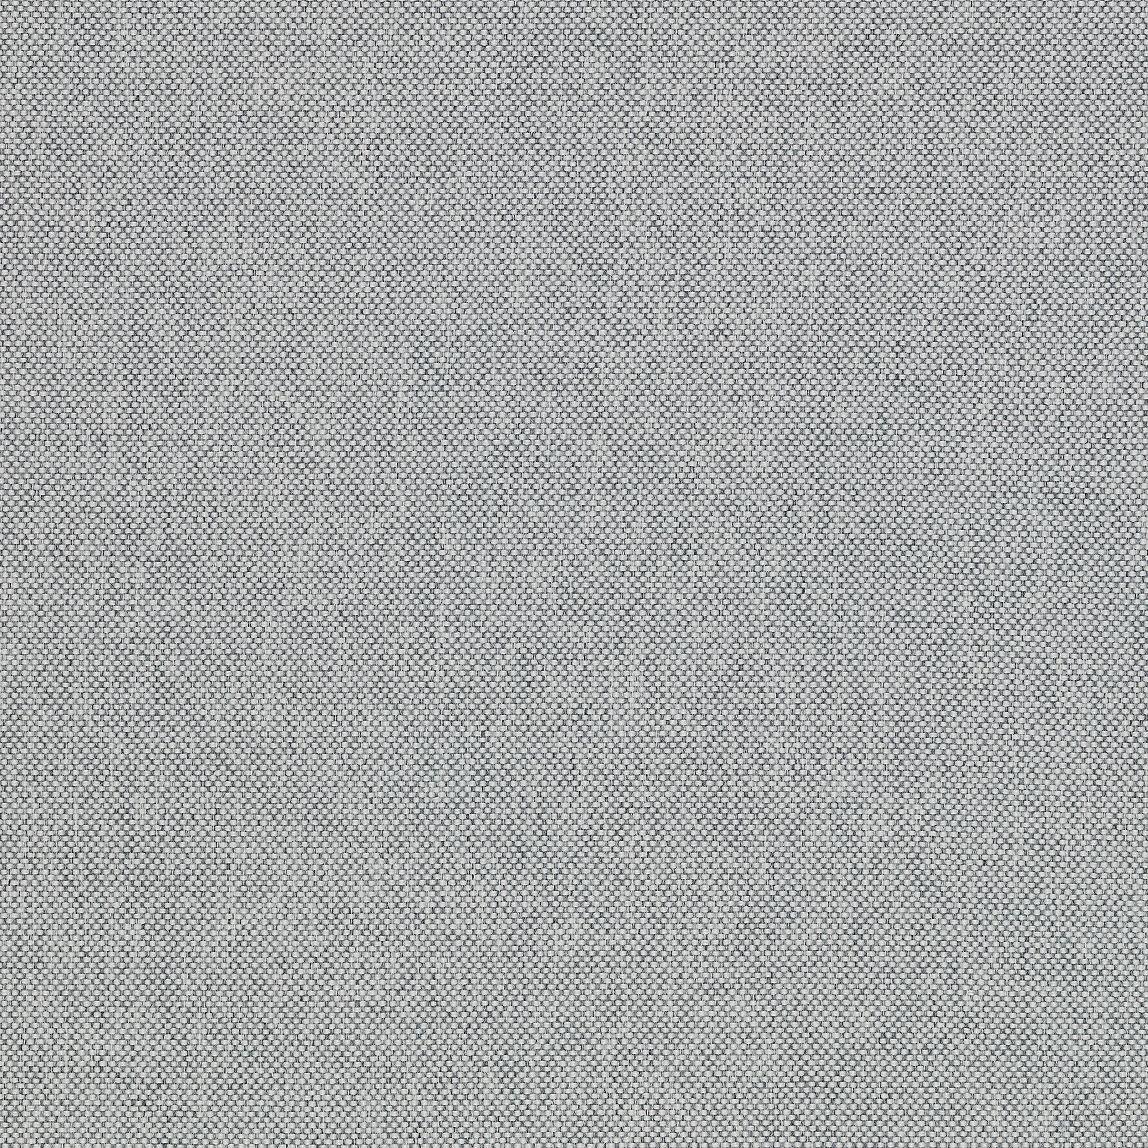 Mode Intaglio Swatch